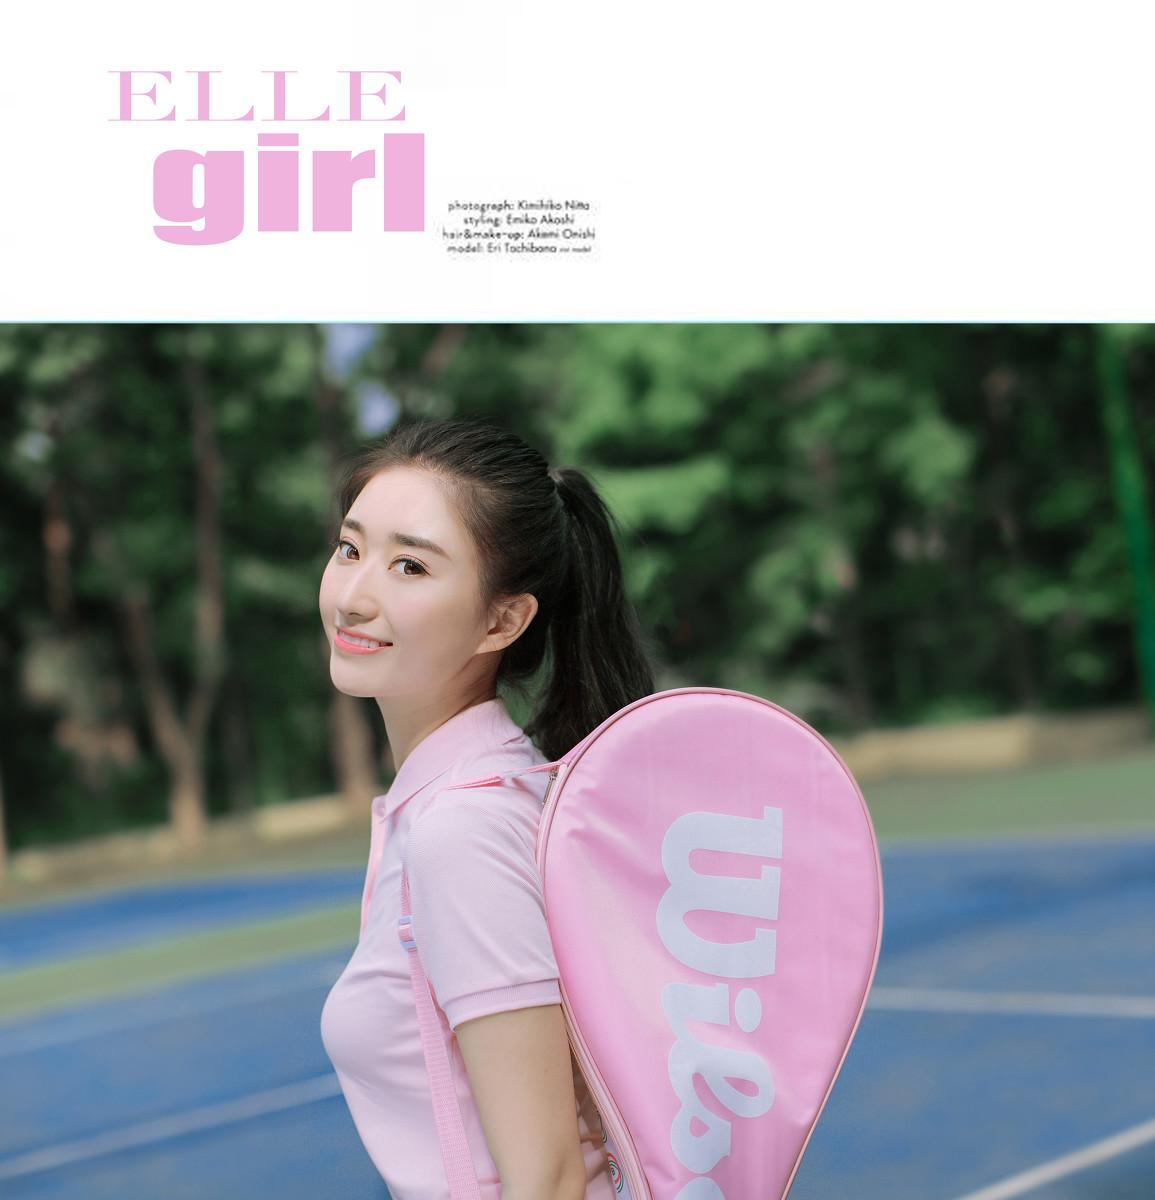 k7体育网平台-华南-广东省-阳江|爱游戏官网